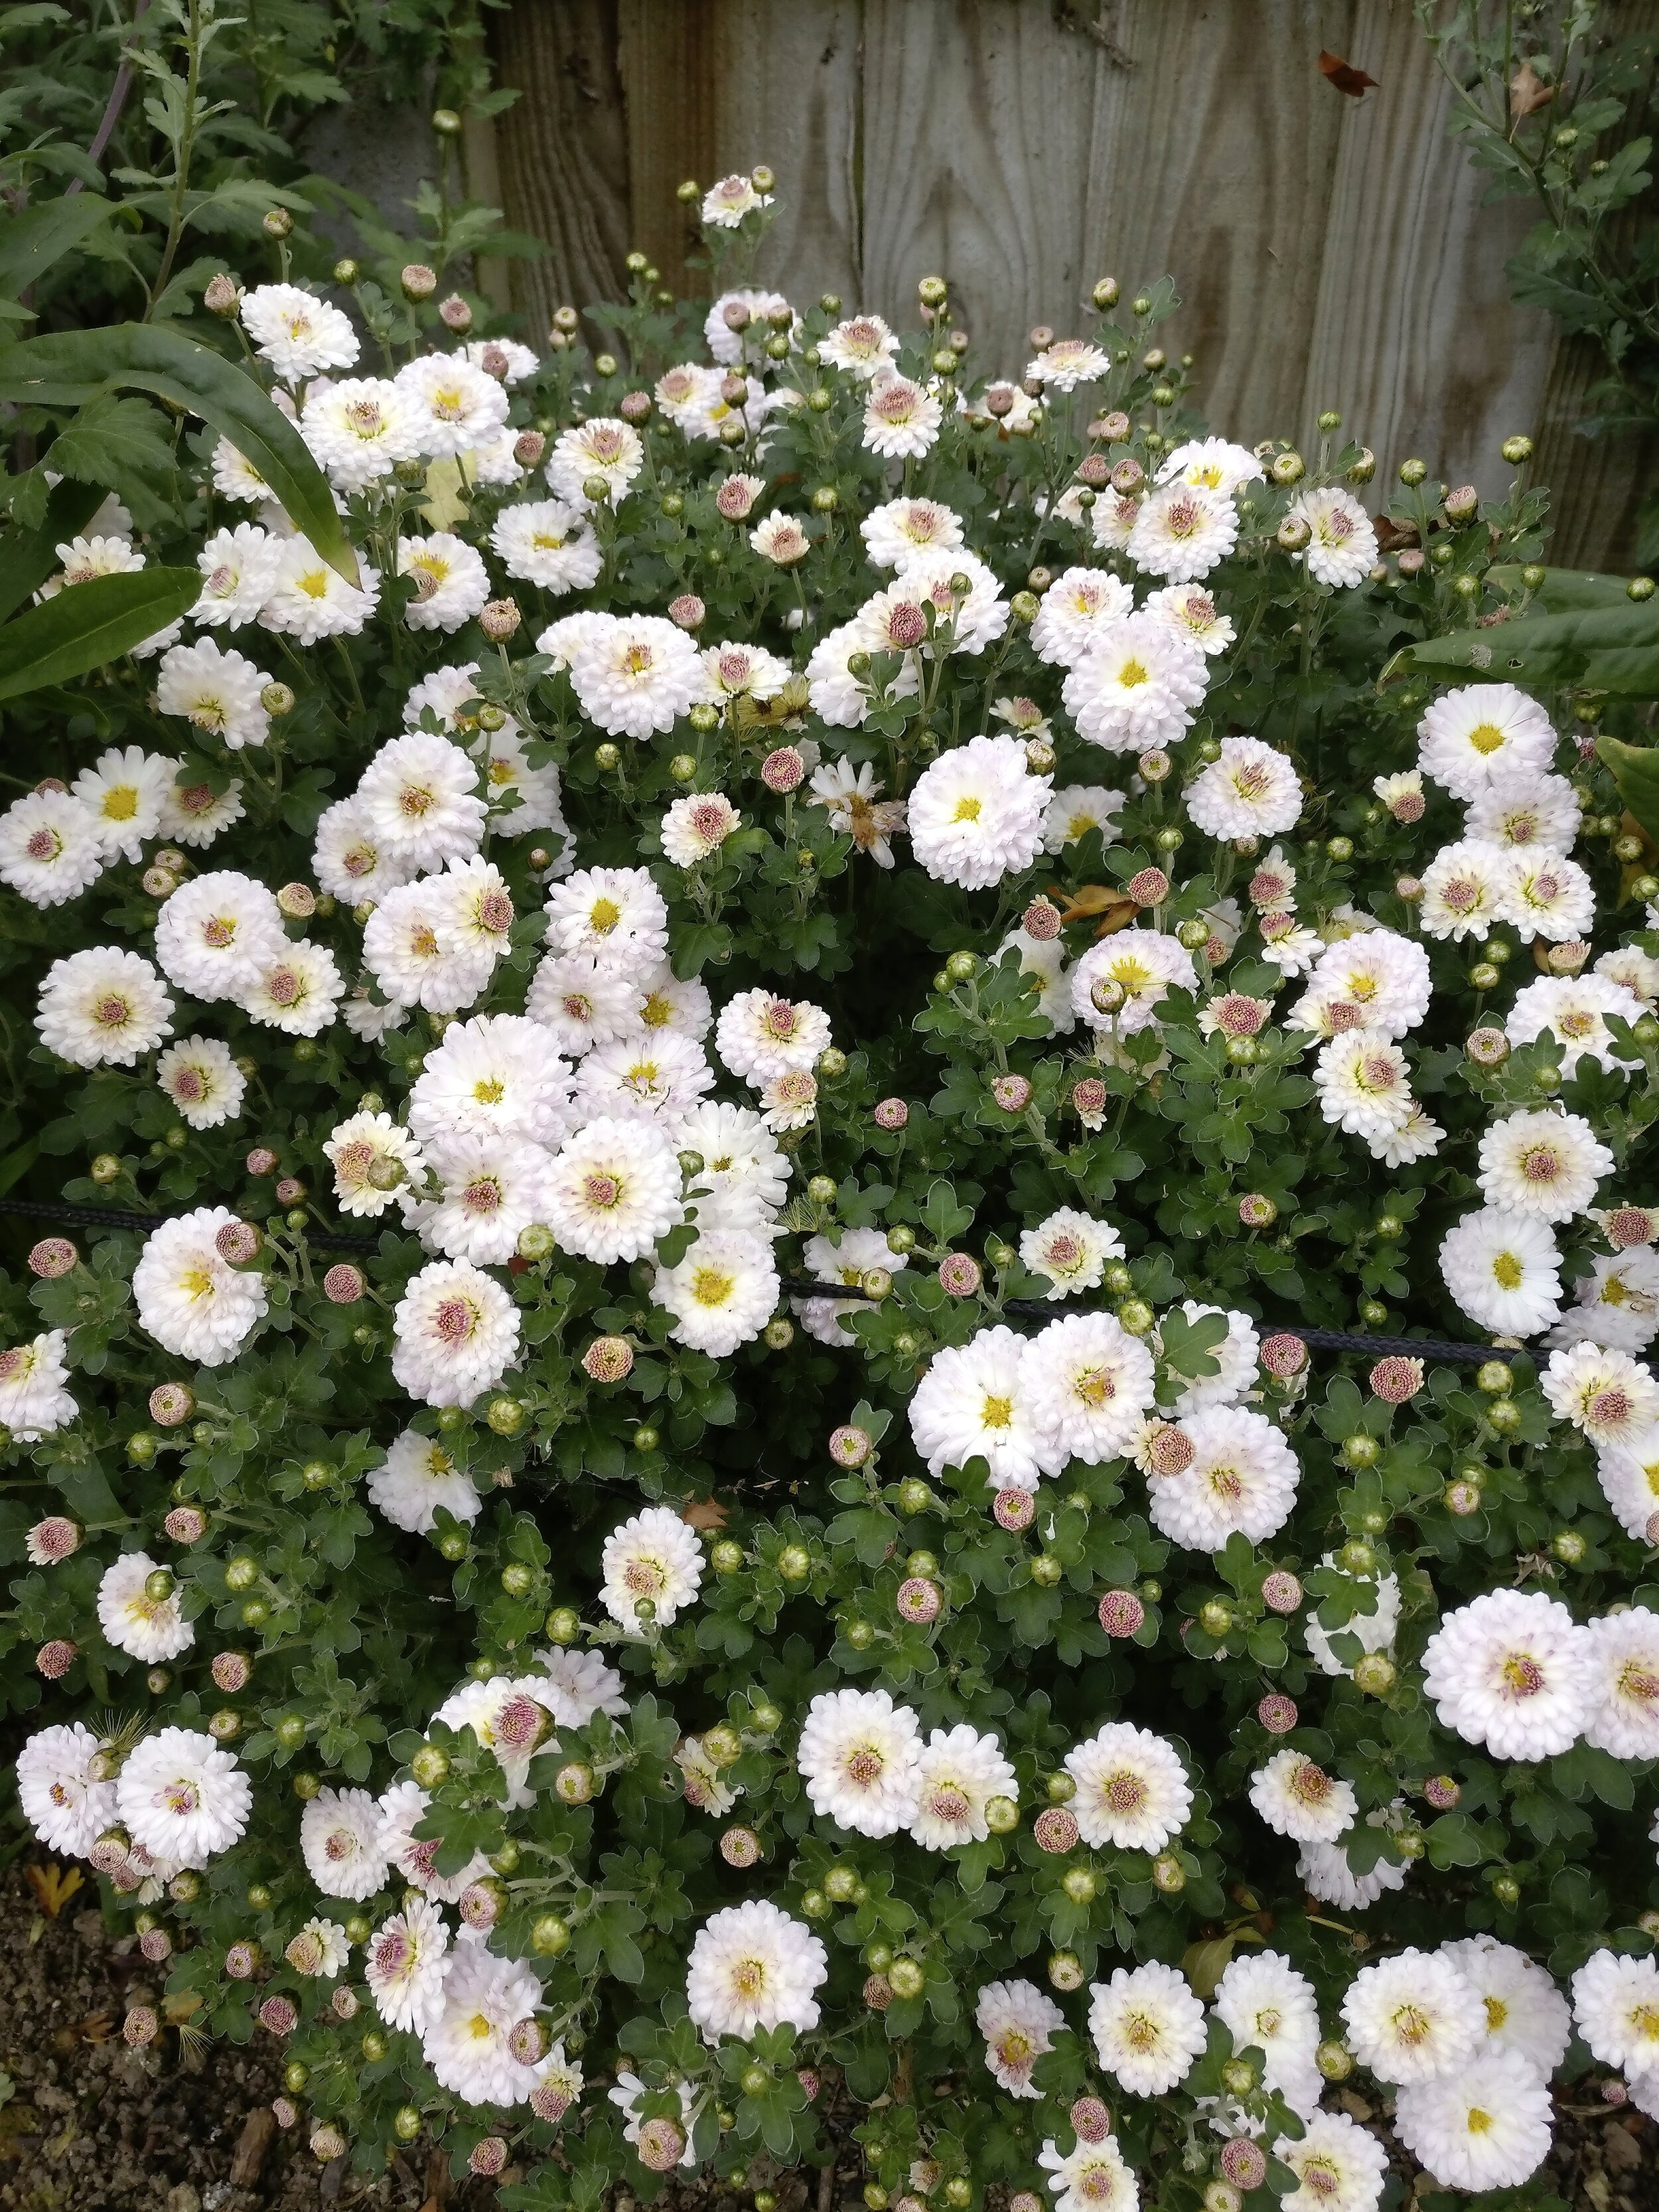 Chrysanthemum 'Romantica'